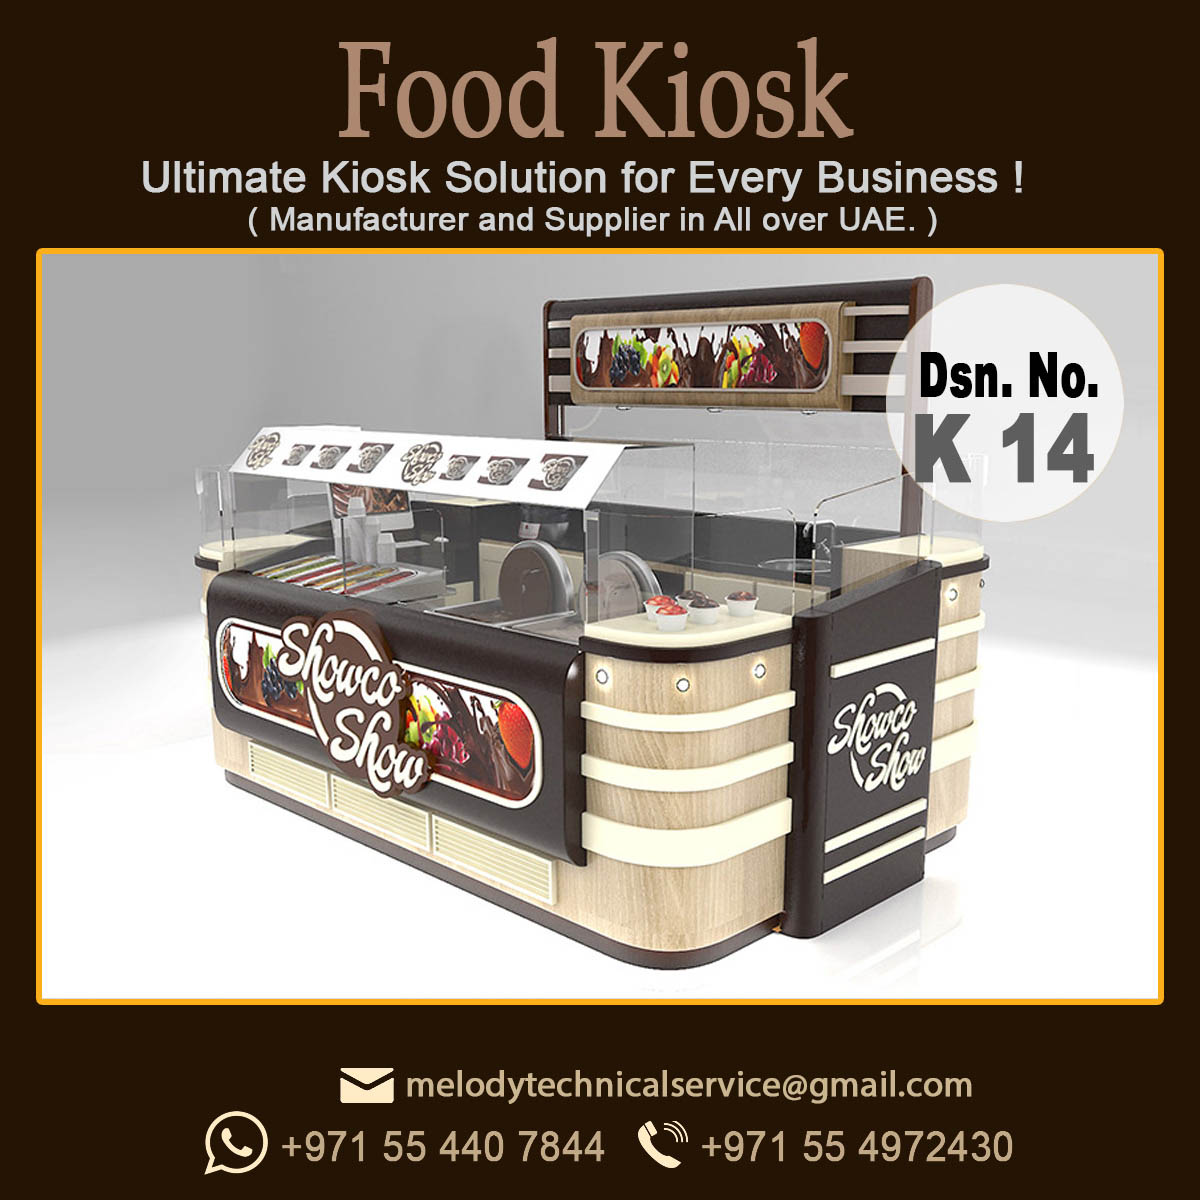 Oud Perfume Kiosk Dubai, Wooden Kiosk Suppliers, Kiosk Design Dubai (3).jpg